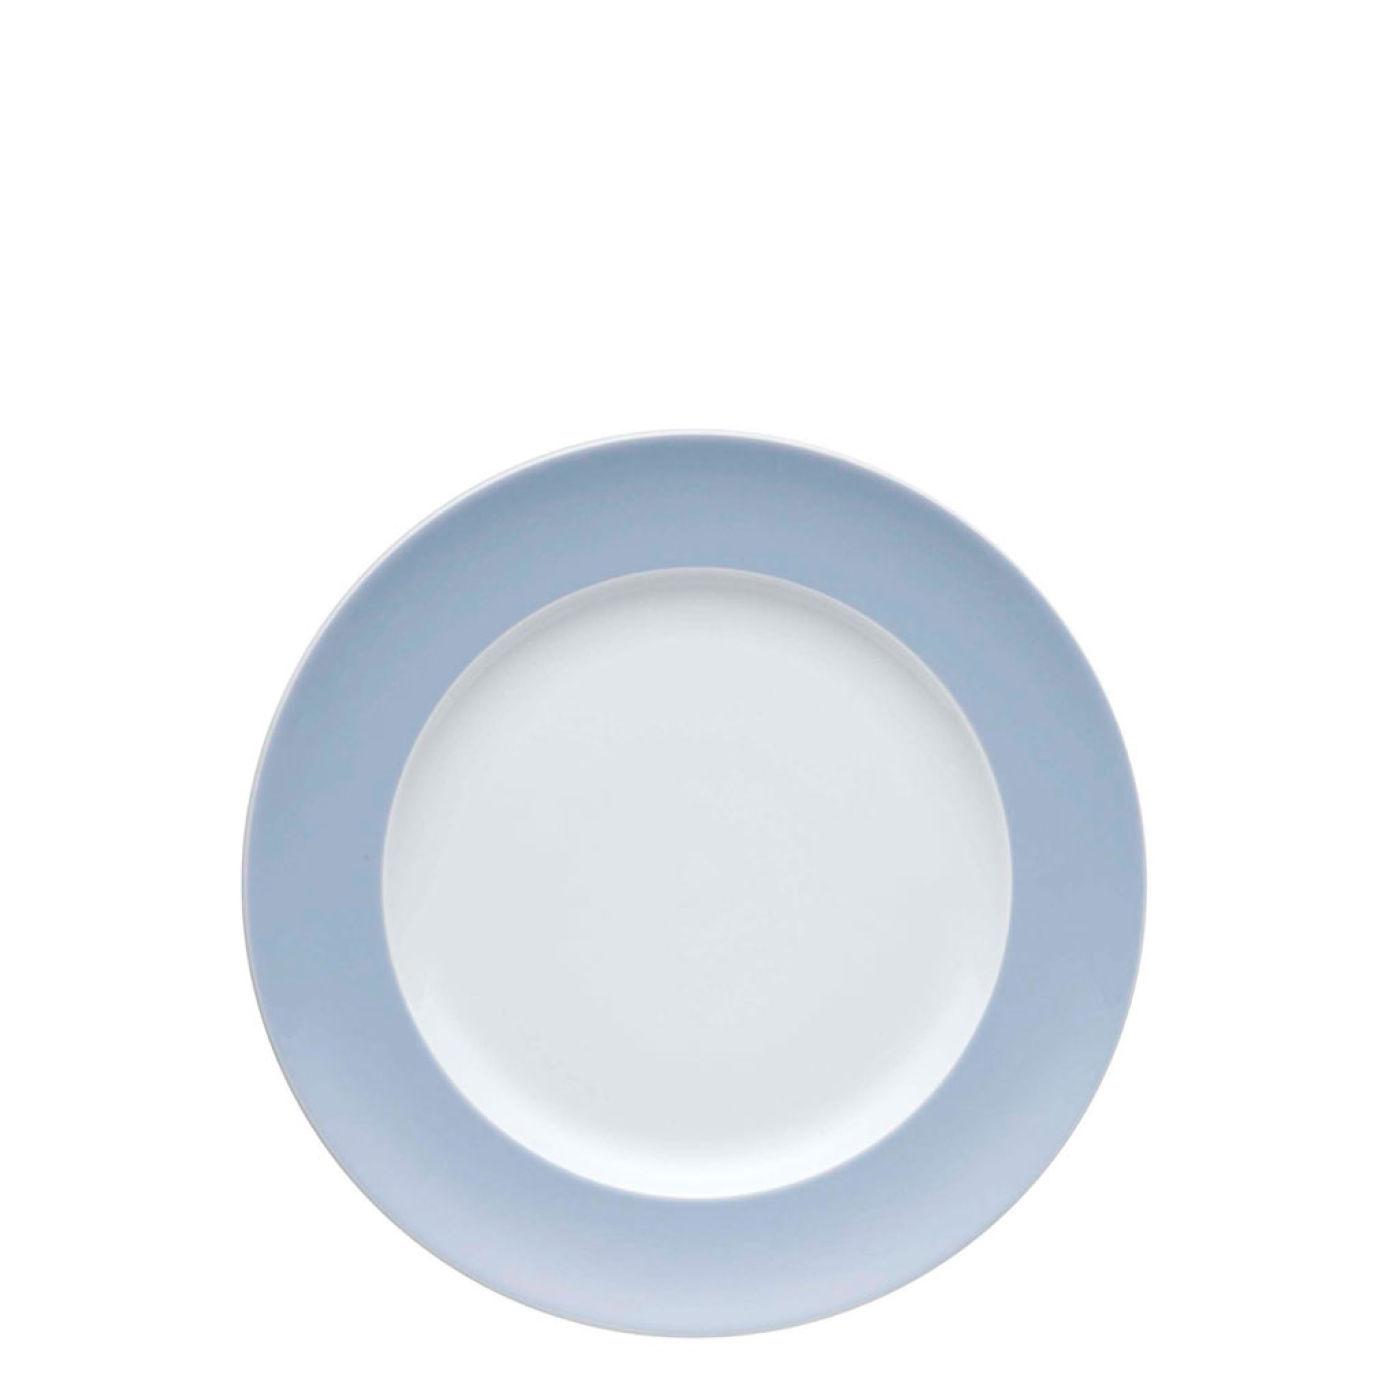 Онлайн каталог PROMENU: Тарелка десертная/закусочная Rosenthal SUNNY DAY, диаметр 22 см, голубой Rosenthal 70850-408510-10222